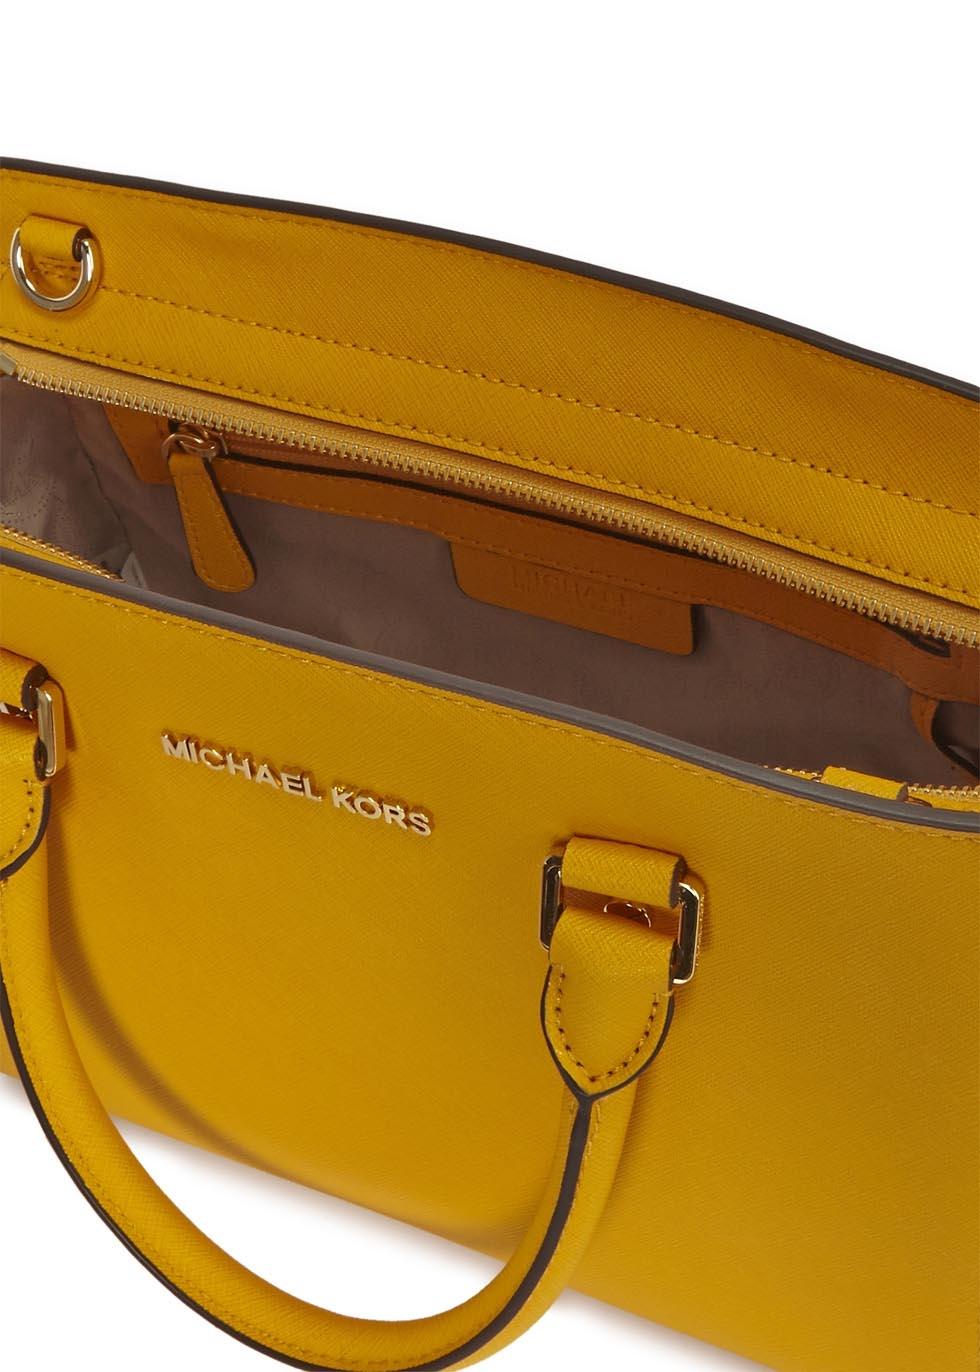 a4dd29b98c73 Michael Kors Selma Medium Mustard Saffiano Leather Tote in Yellow - Lyst